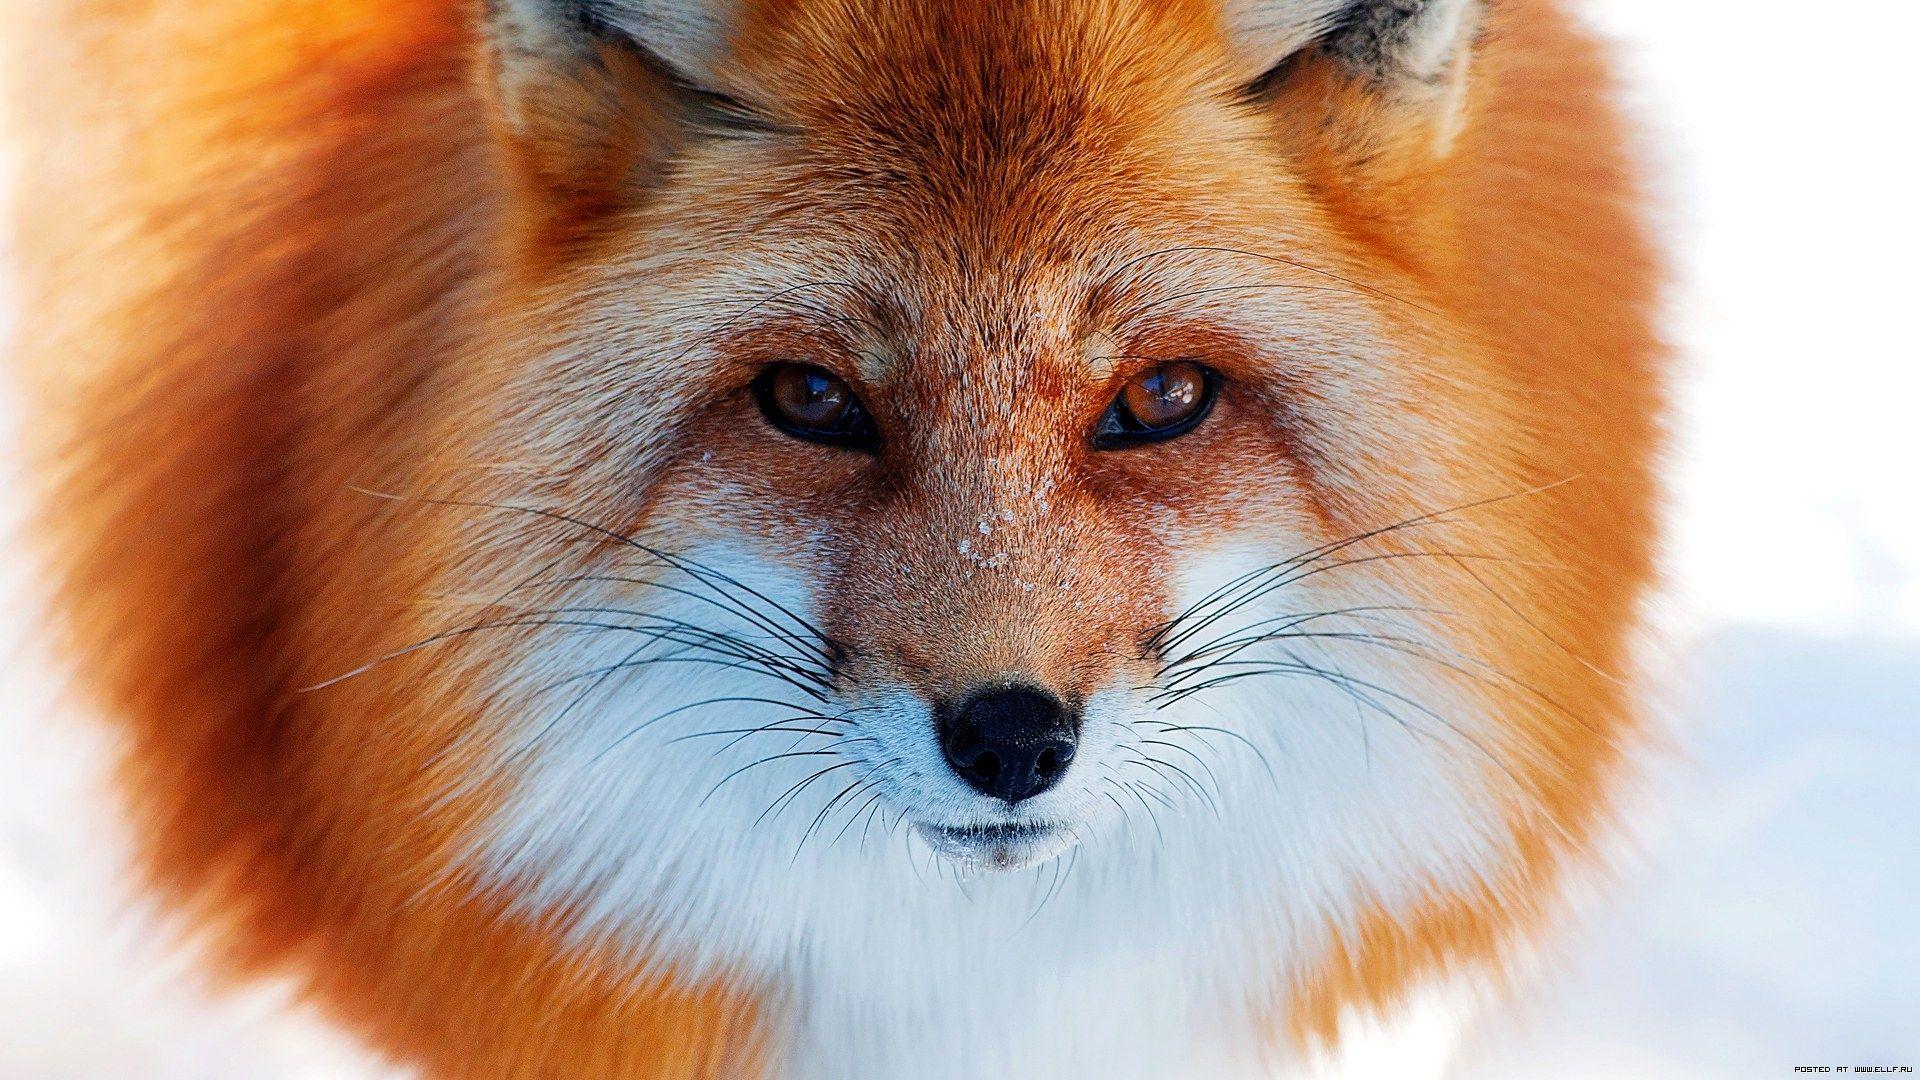 The Fox Photos